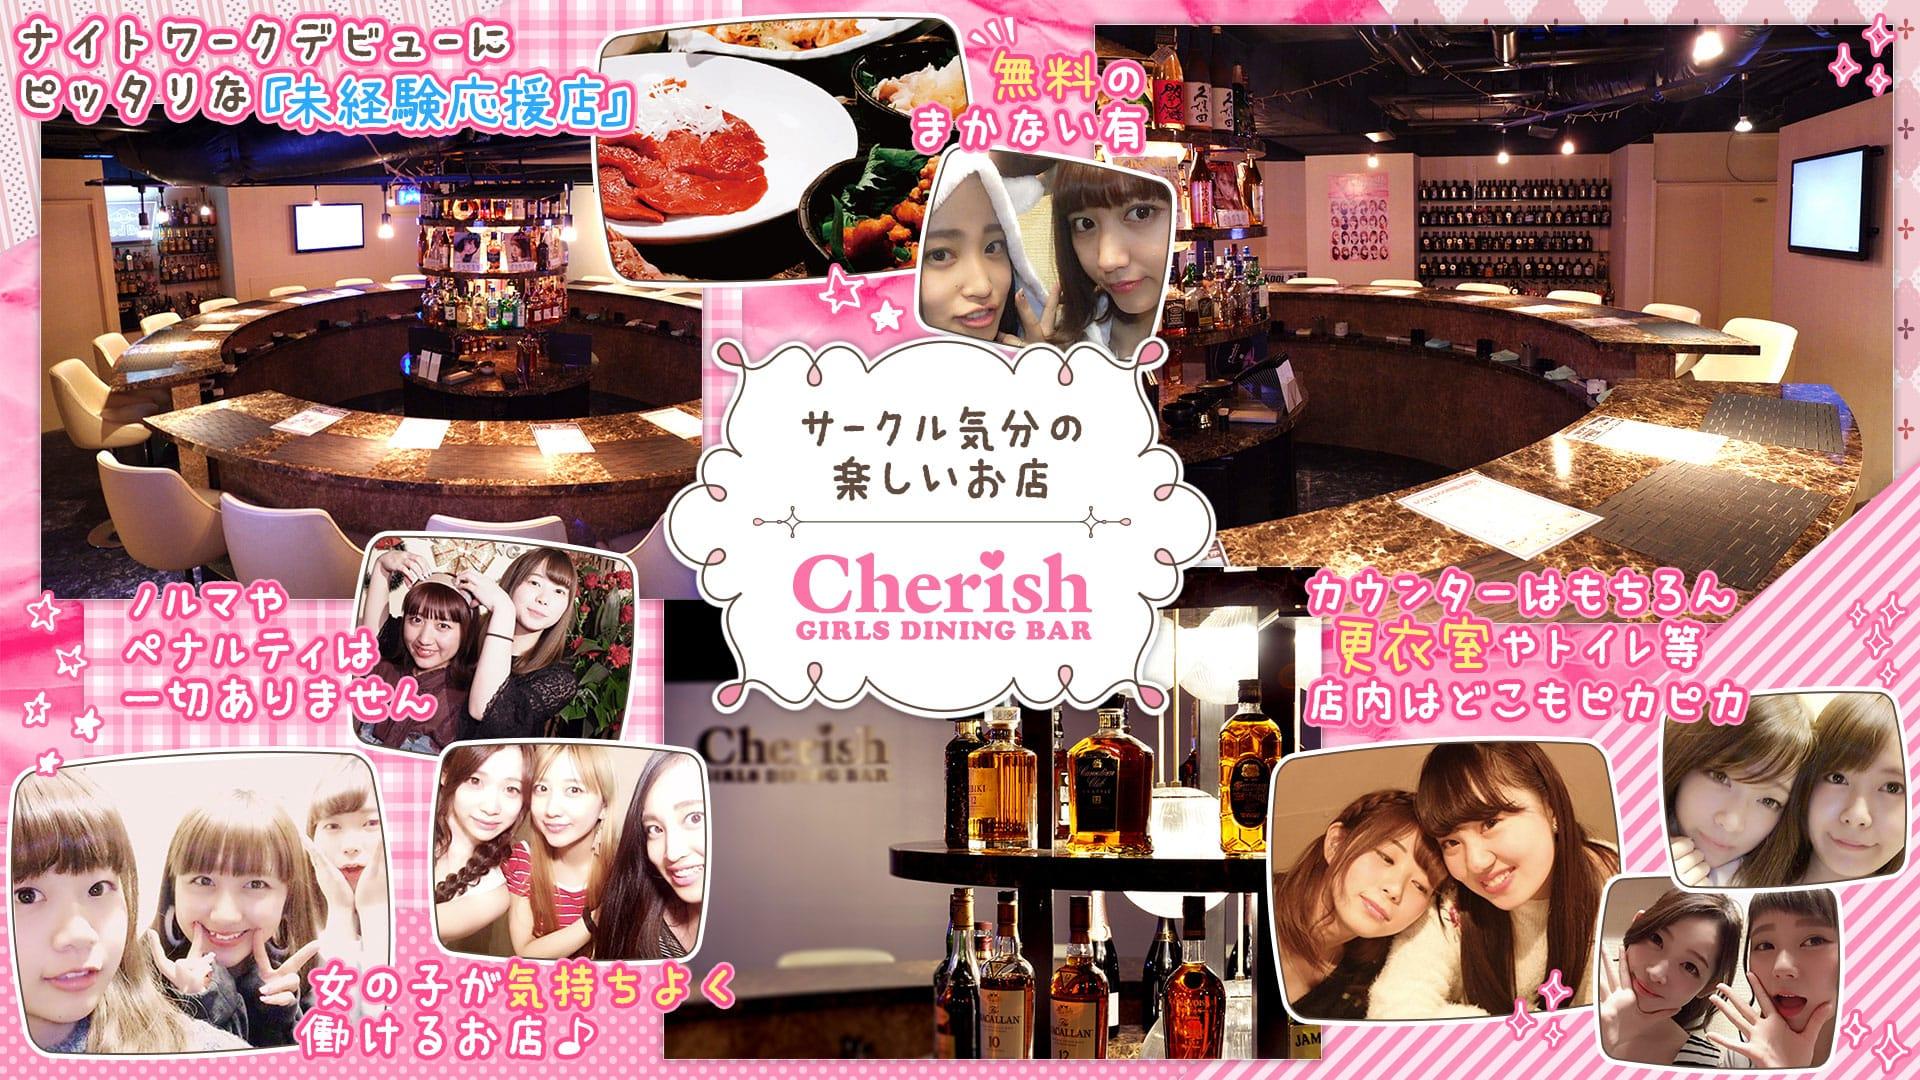 GIRLS DINING BAR Cherish<チェリッシュ1号店> 池袋 ガールズバー TOP画像